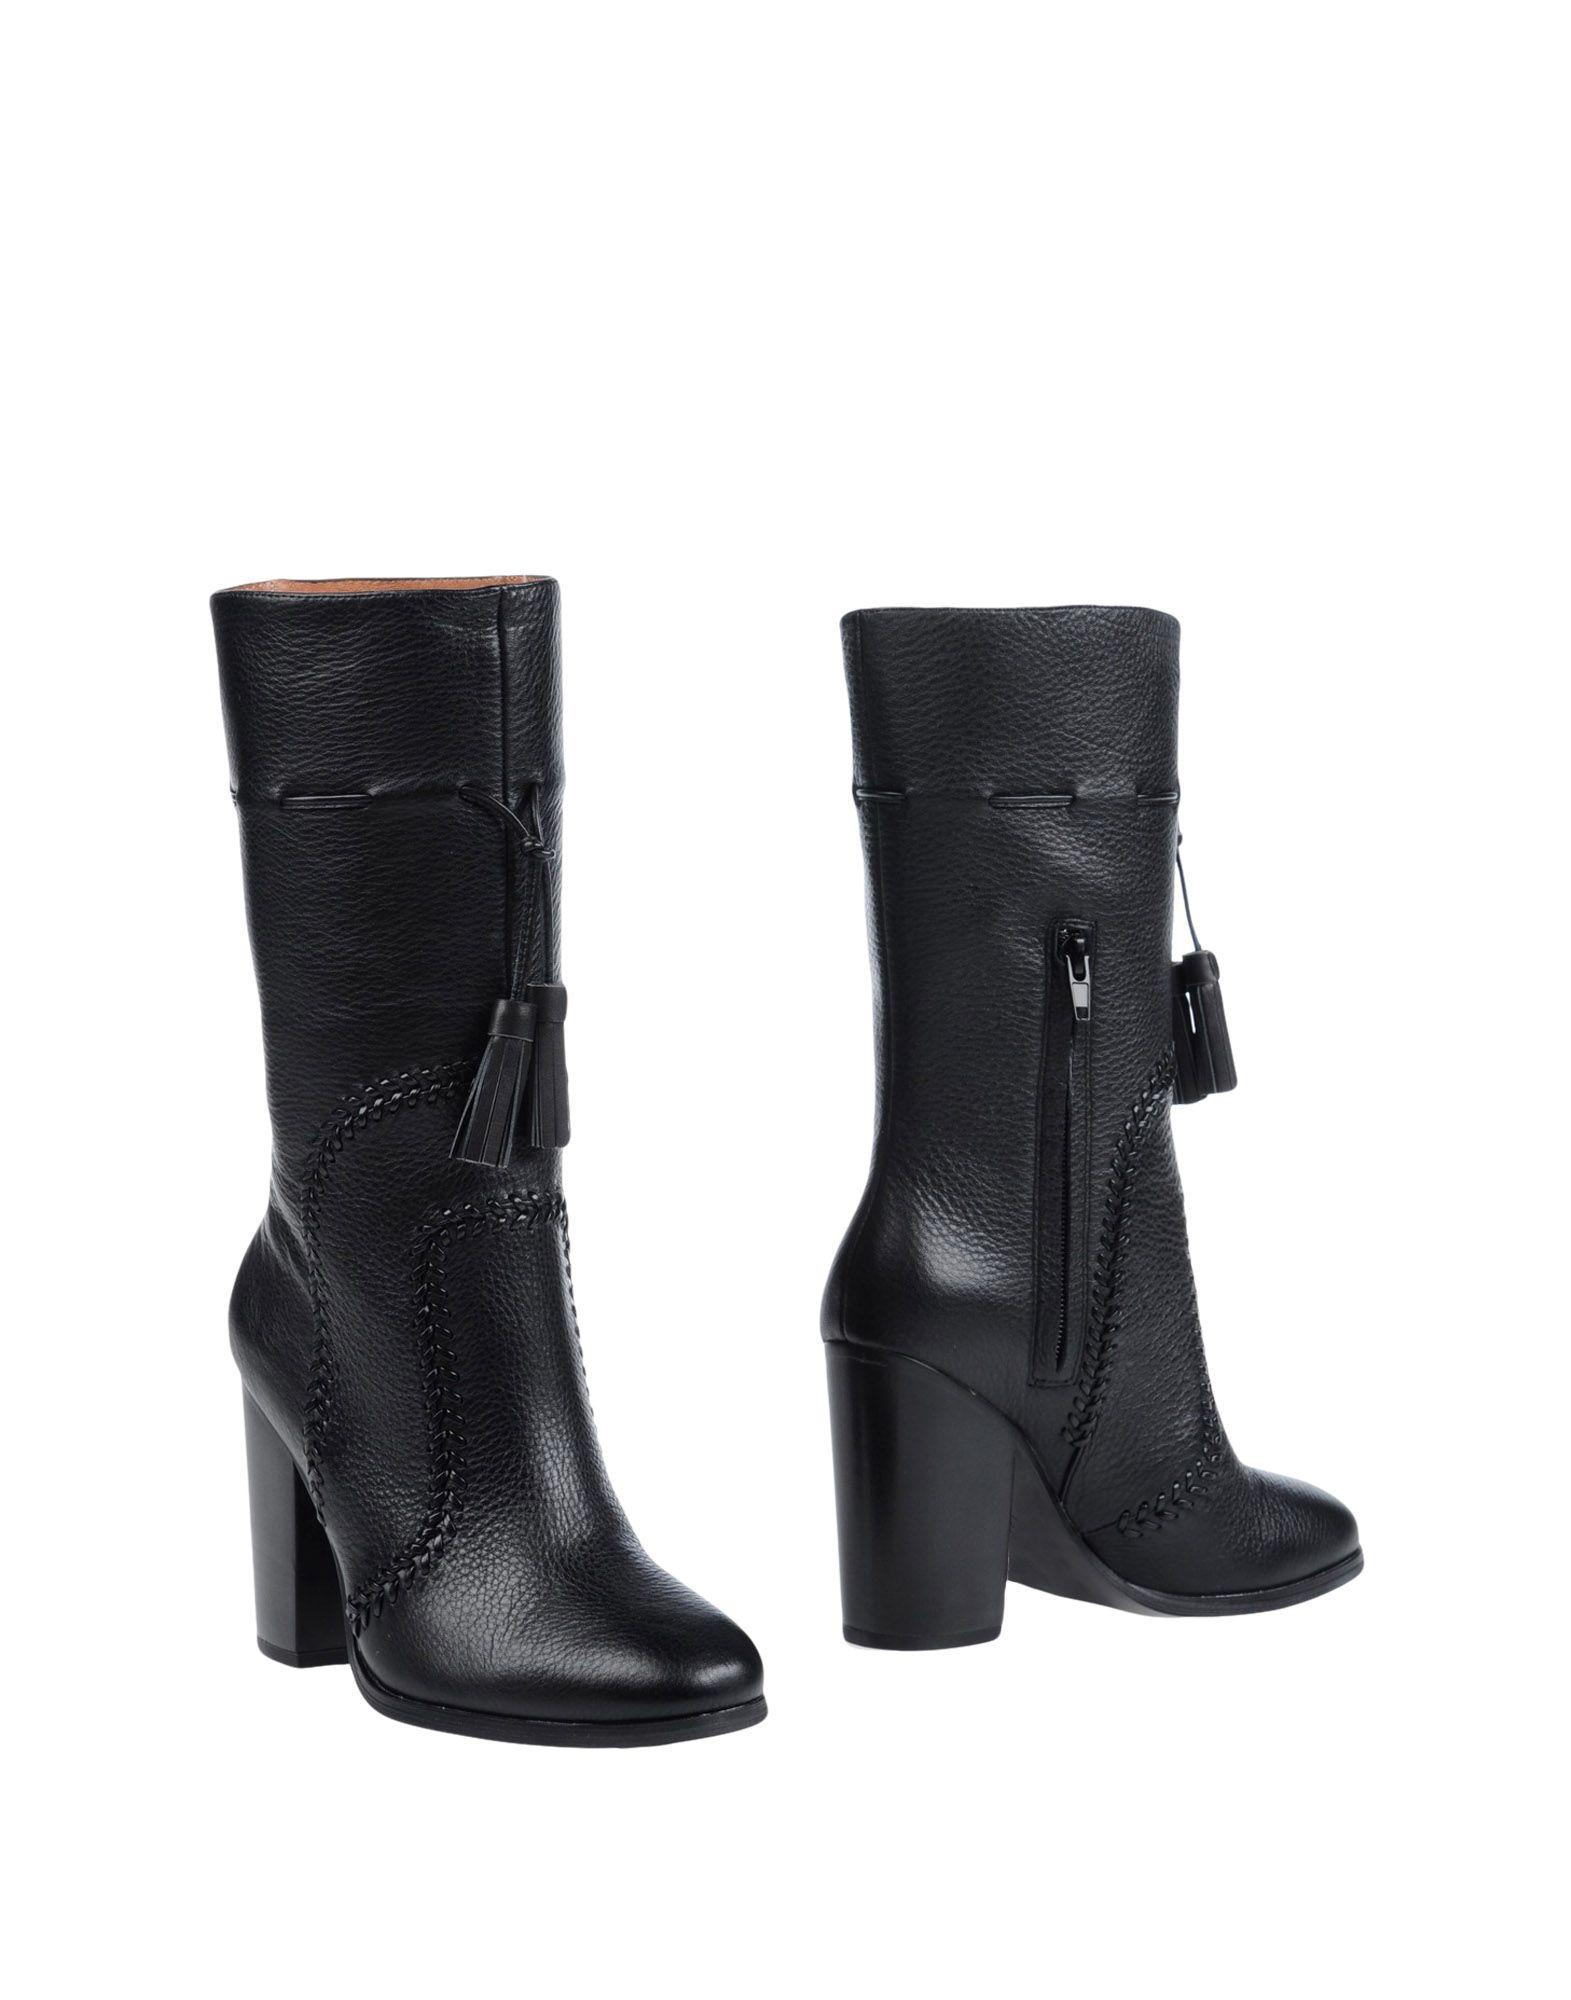 Stilvolle billige Schuhe Damen Lola Cruz Stiefelette Damen Schuhe  11264480CX 3b8349